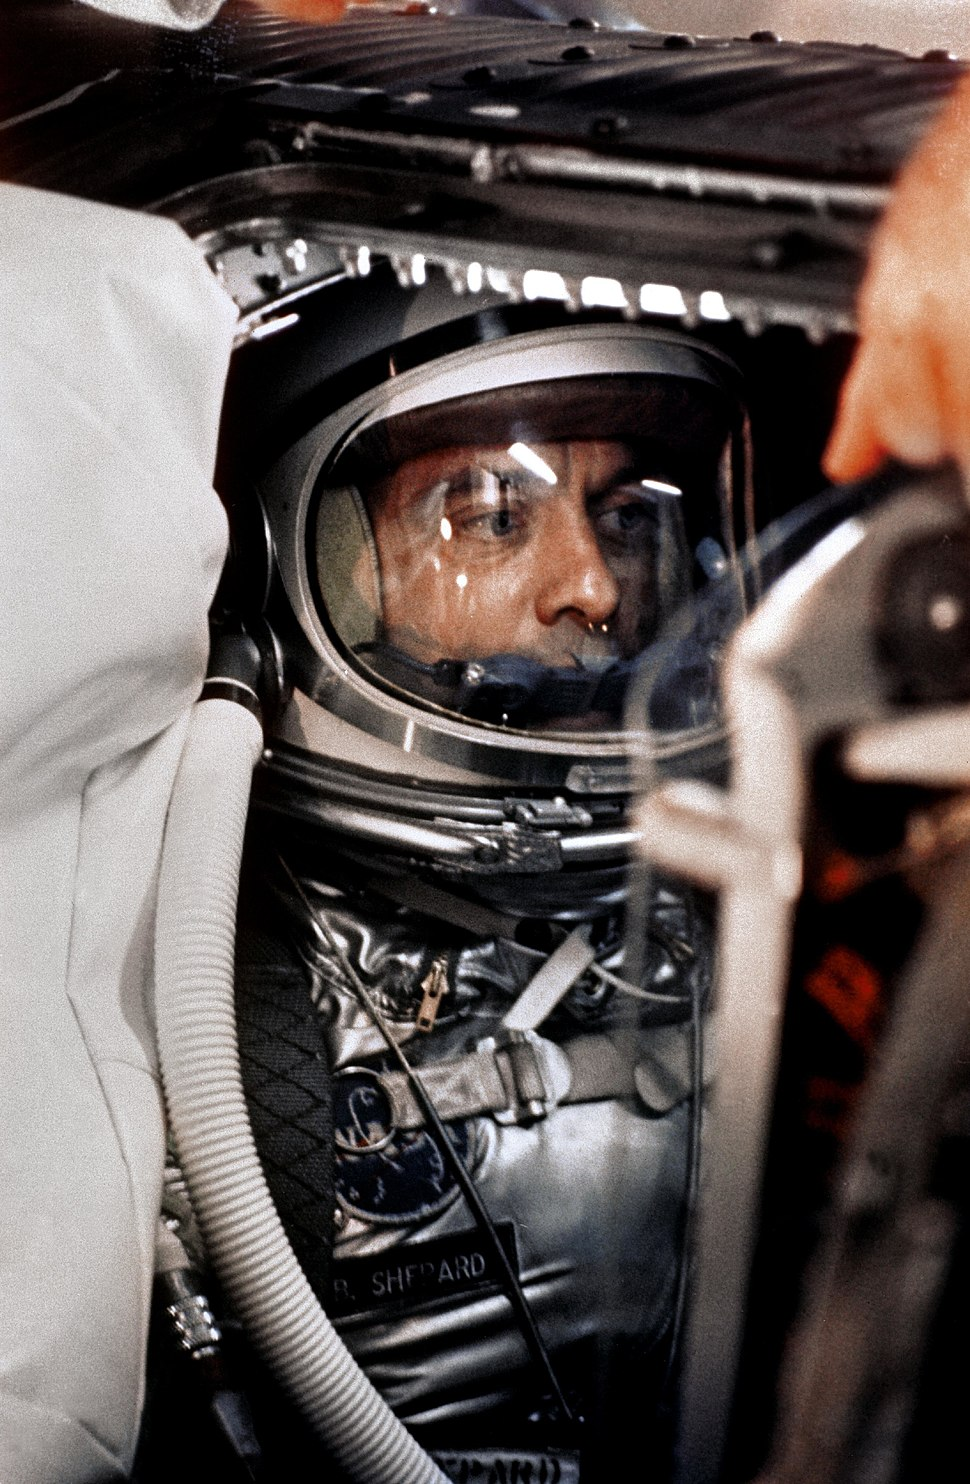 Alan Shepard in capsule aboard Freedom 7 before launch